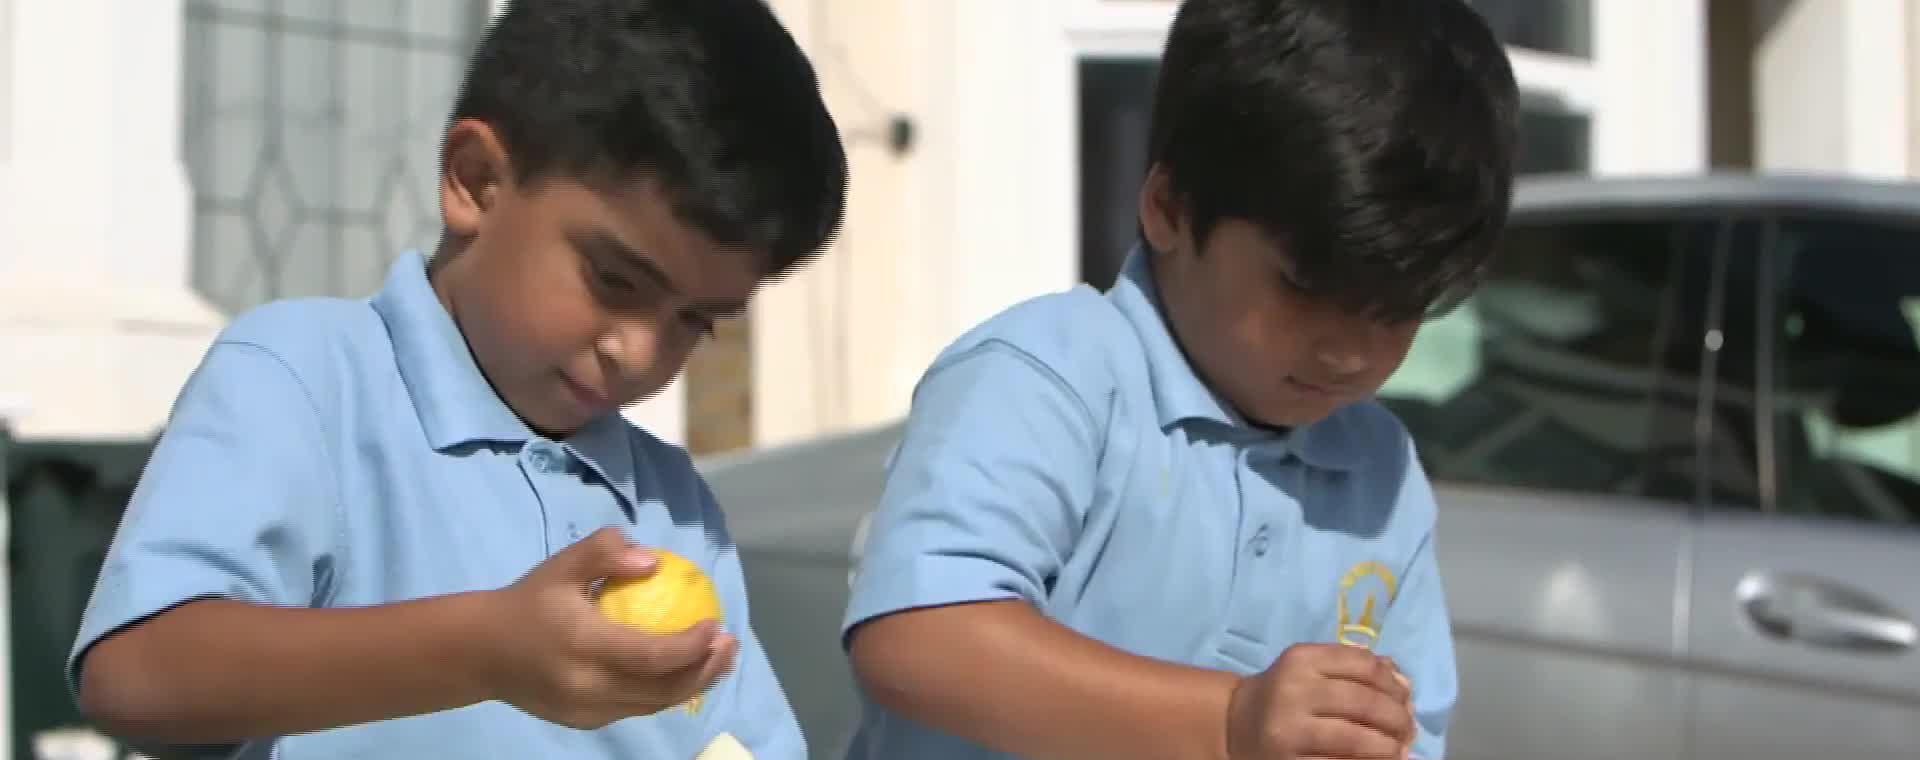 Angelina Donates To Lemon aid Boys